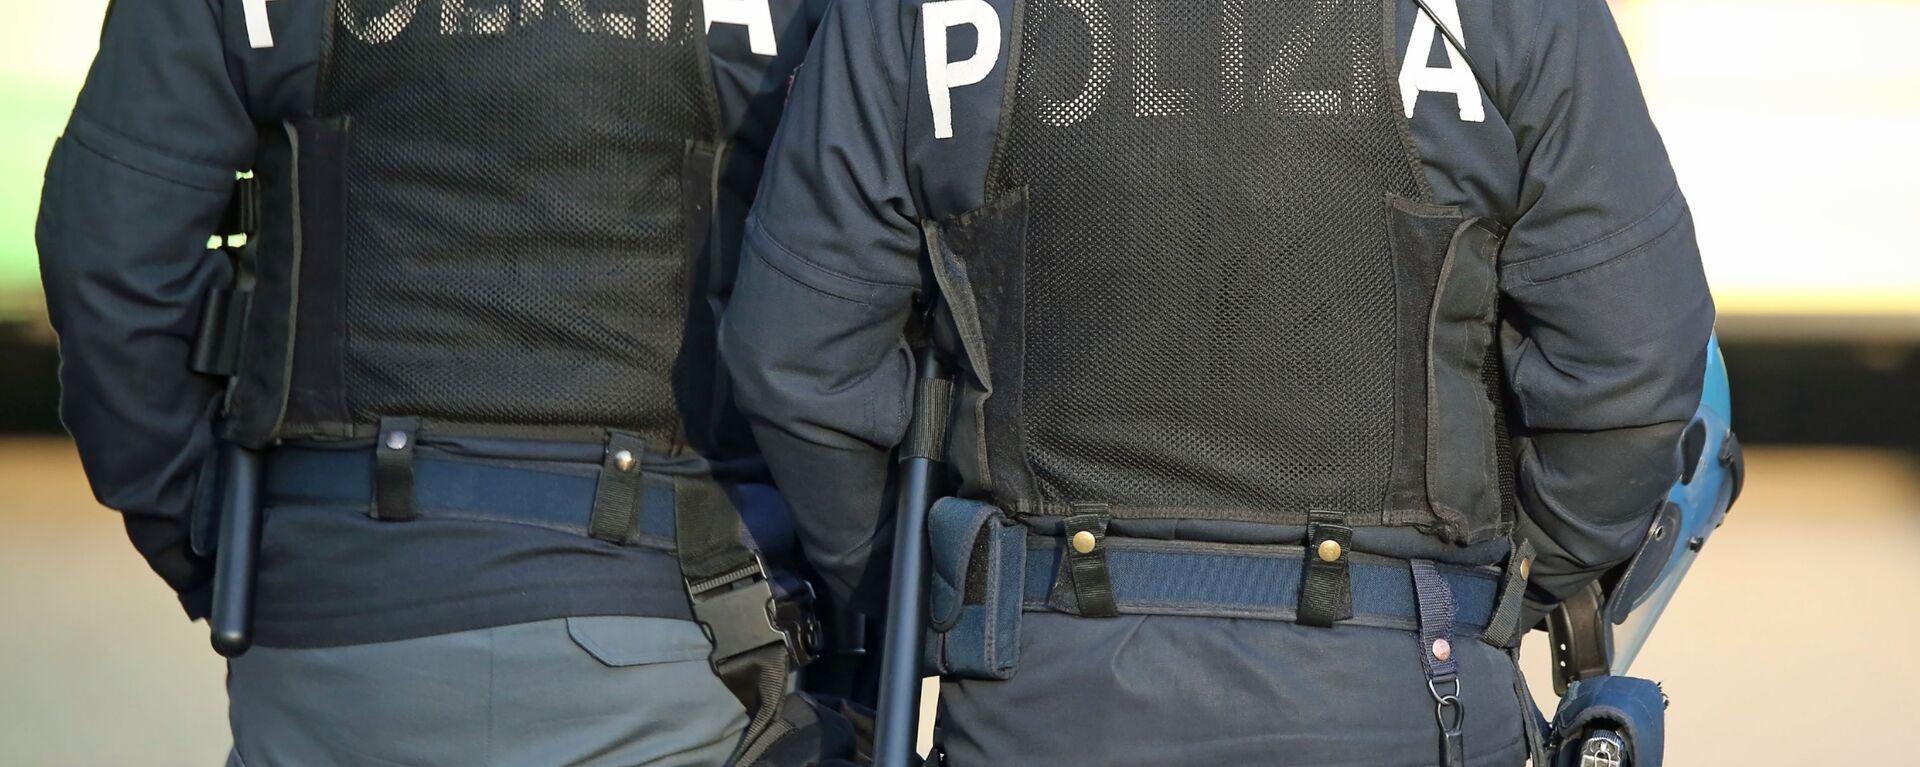 La polizia italiana - Sputnik Italia, 1920, 29.05.2021